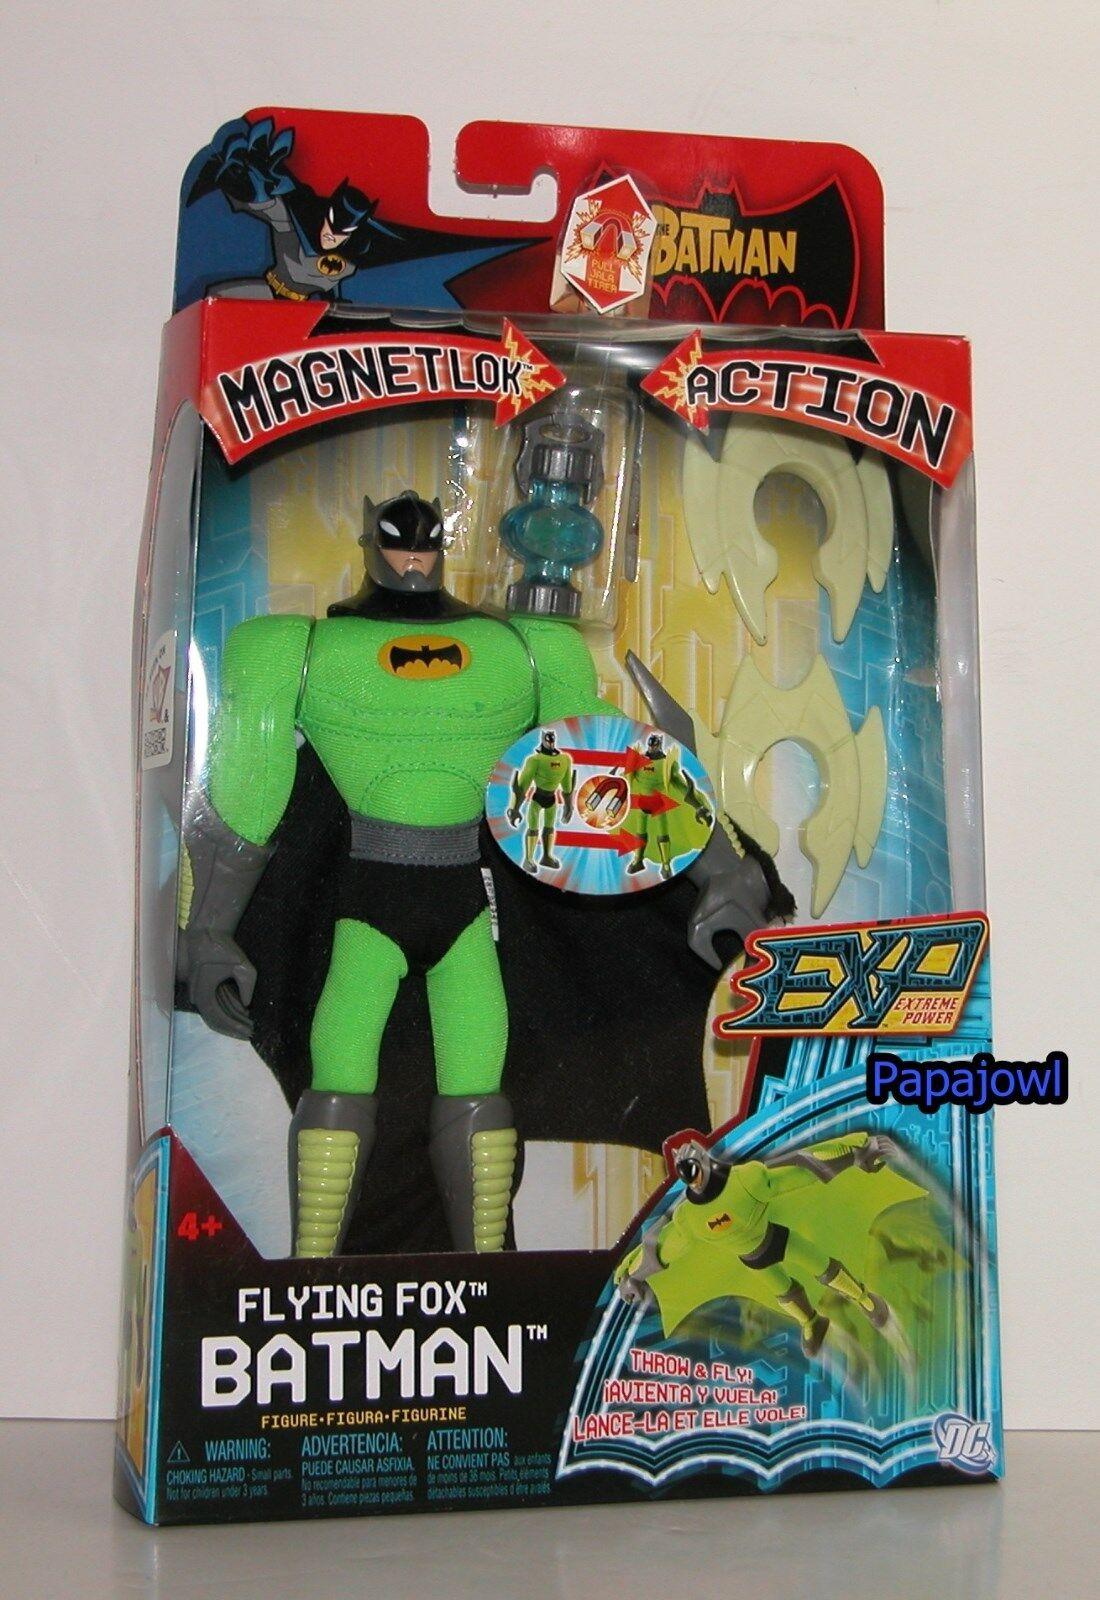 EXP Extreme Power Flying Fox Batman Magnet lok Action 8